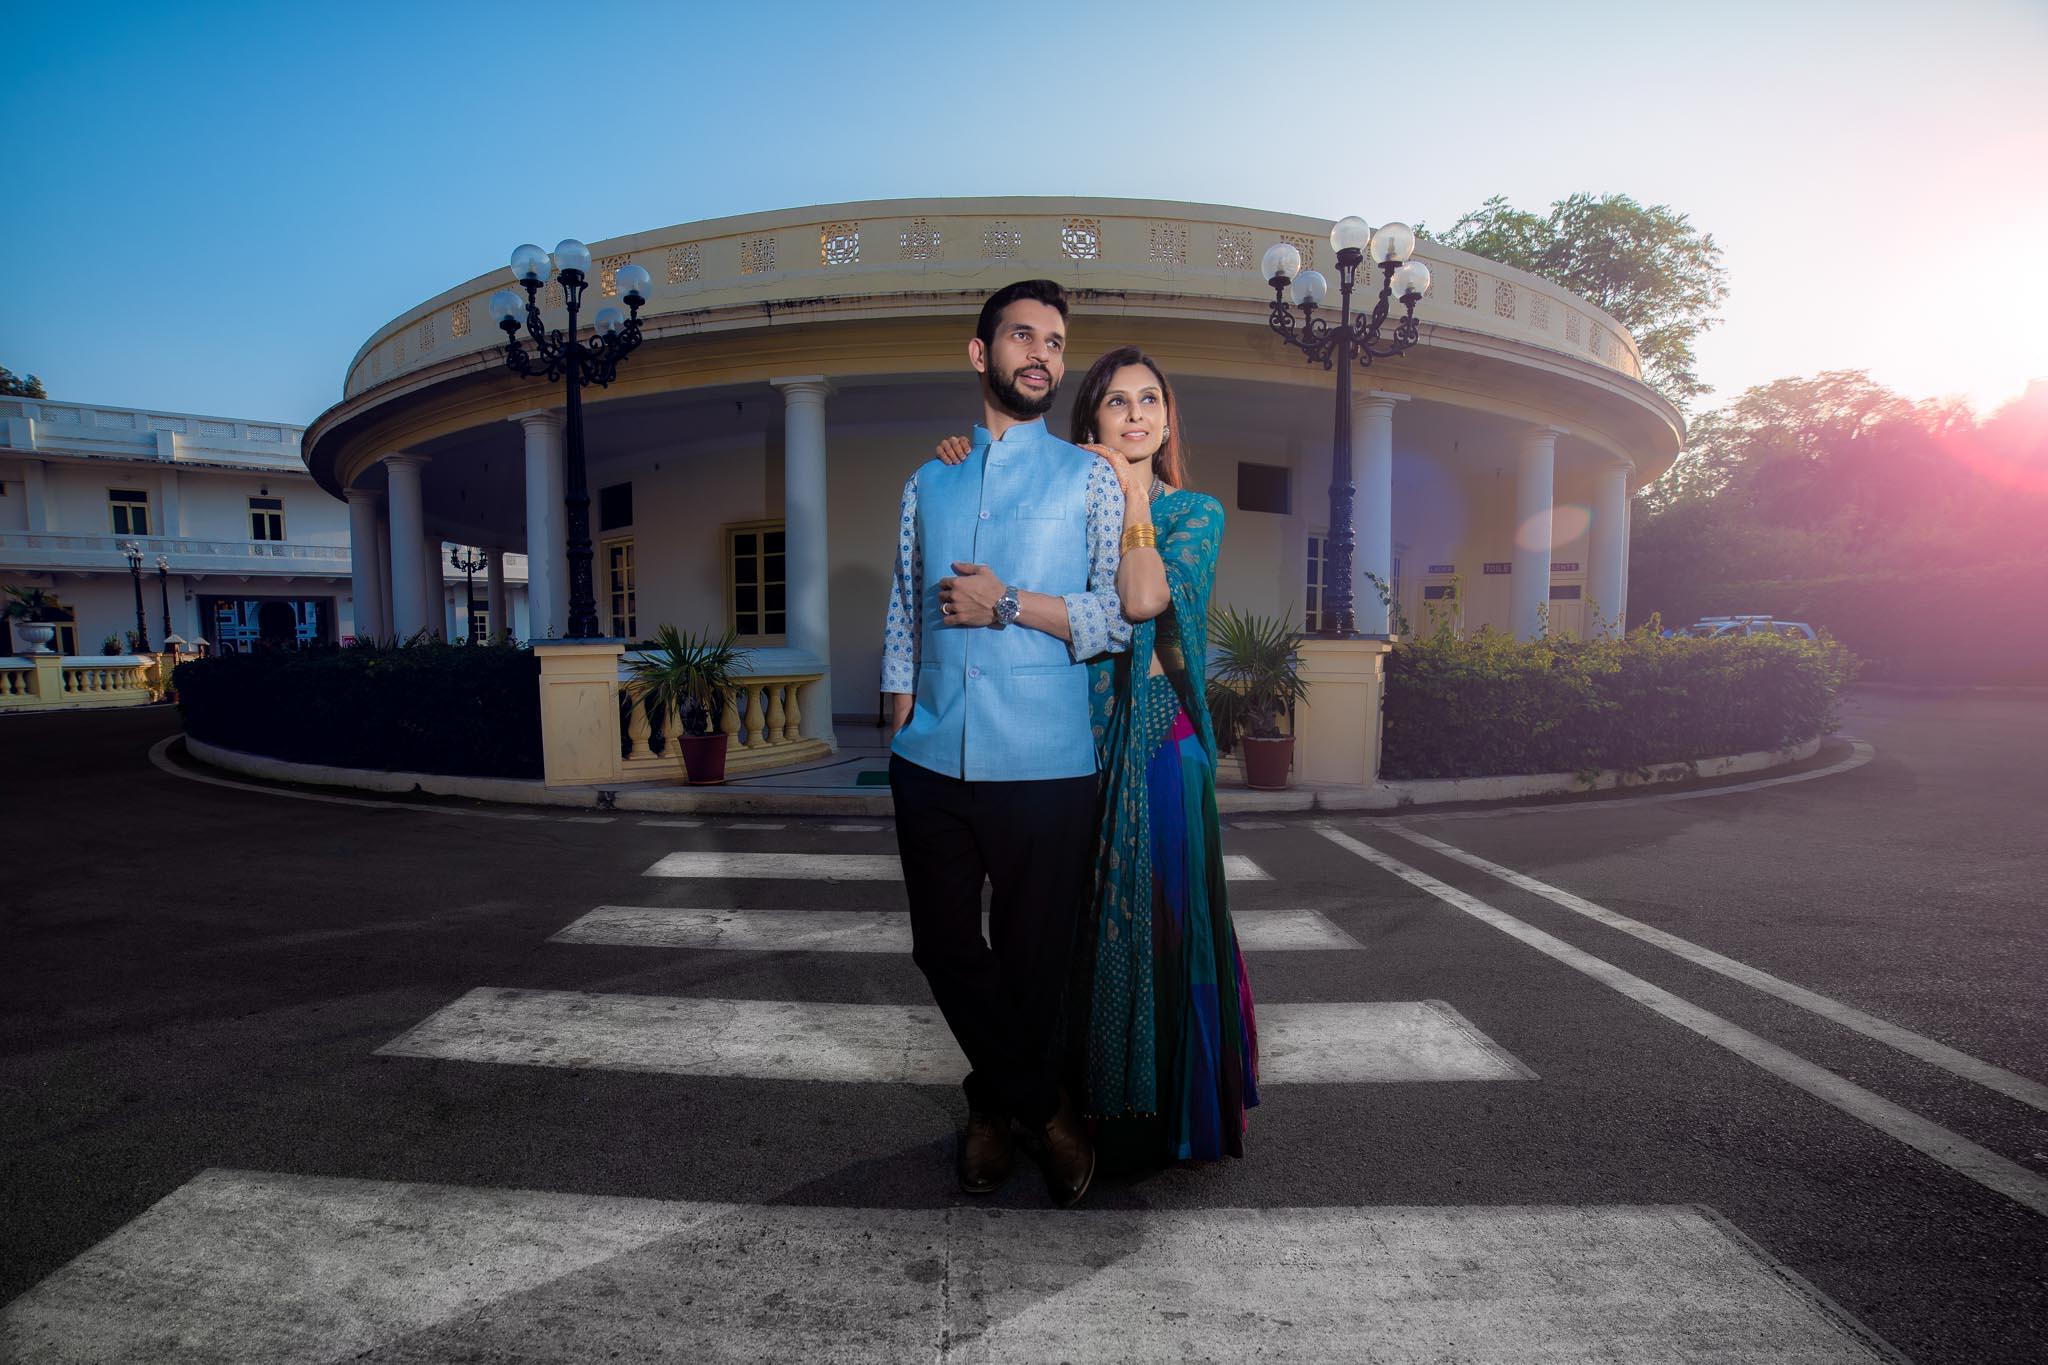 Best-of-2018-wedding-photography-focuz-studios-68